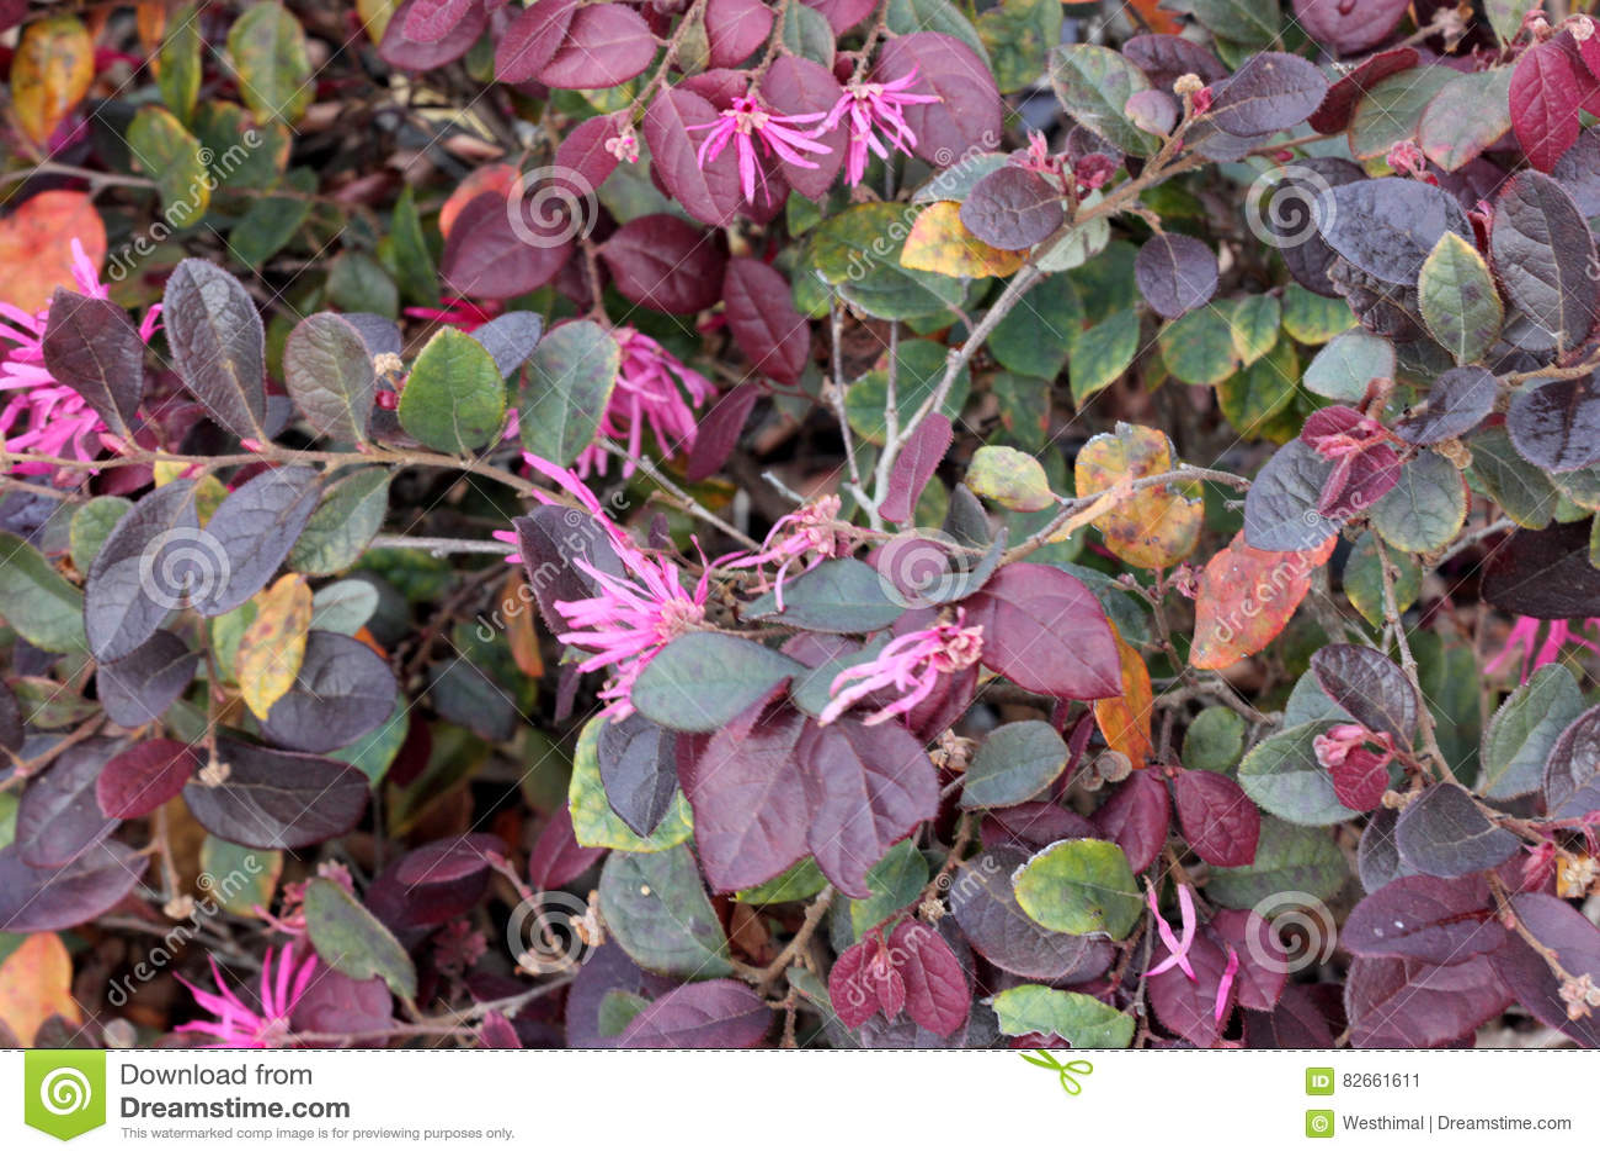 Loropetalum Chinense Rubrum Chinese Pink Pink Chinese Fringe